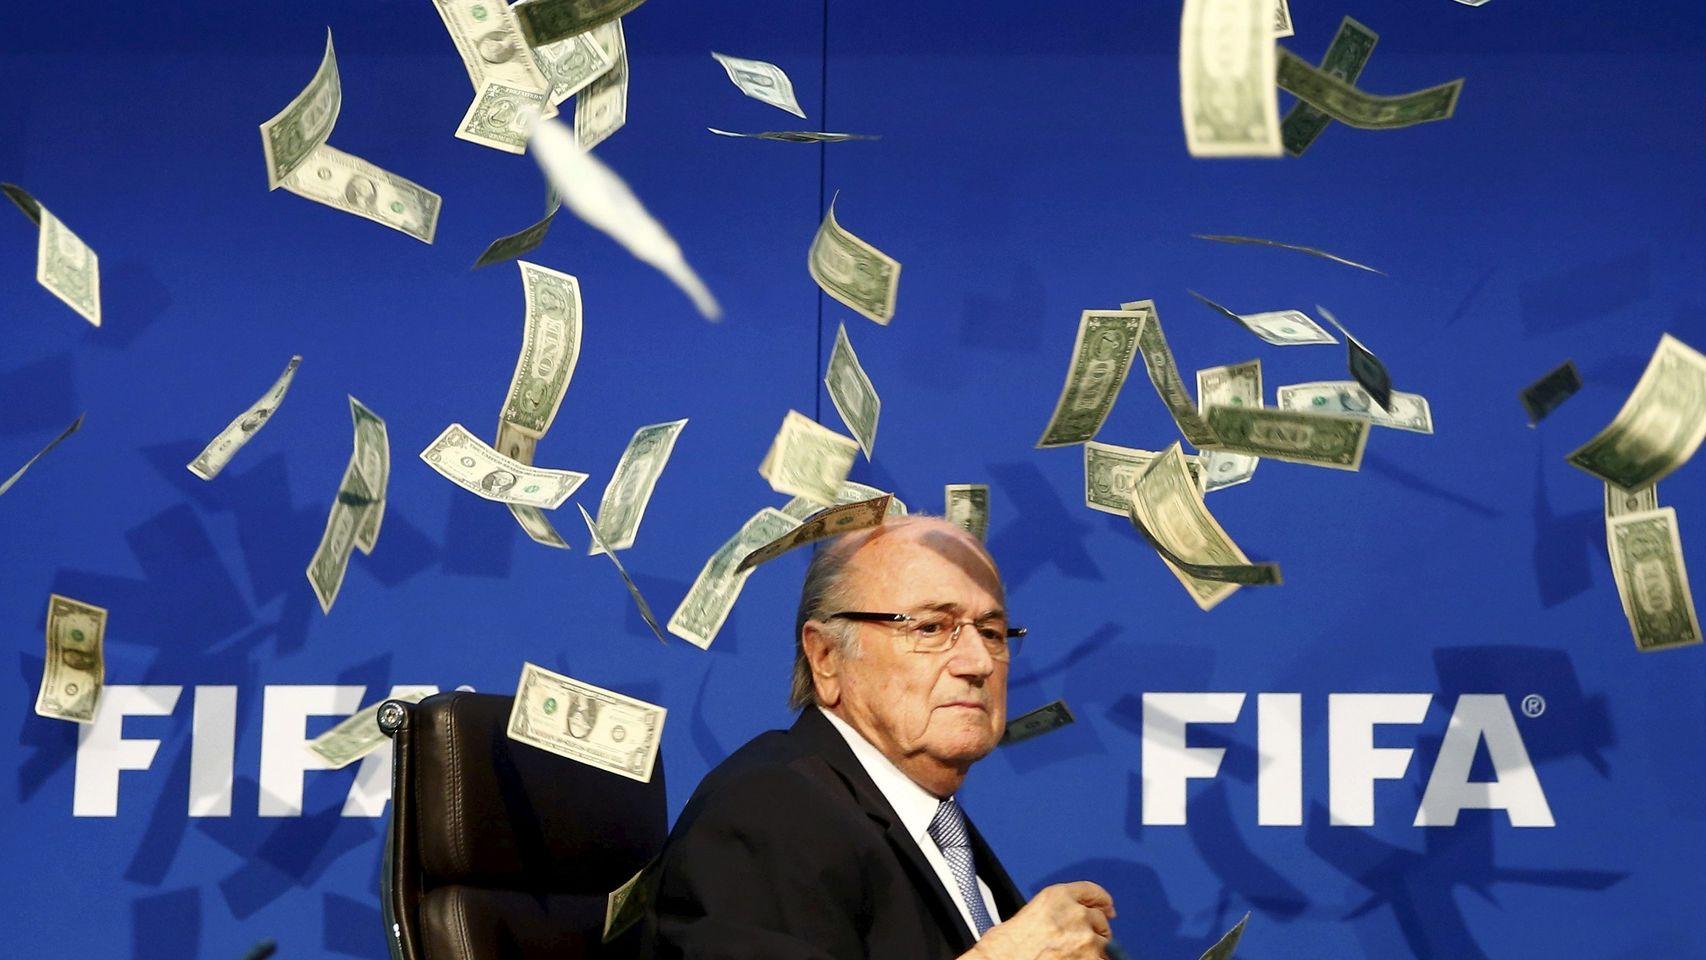 Joseph-Blatter-rueda-prensa_66753410_52903_1706x960